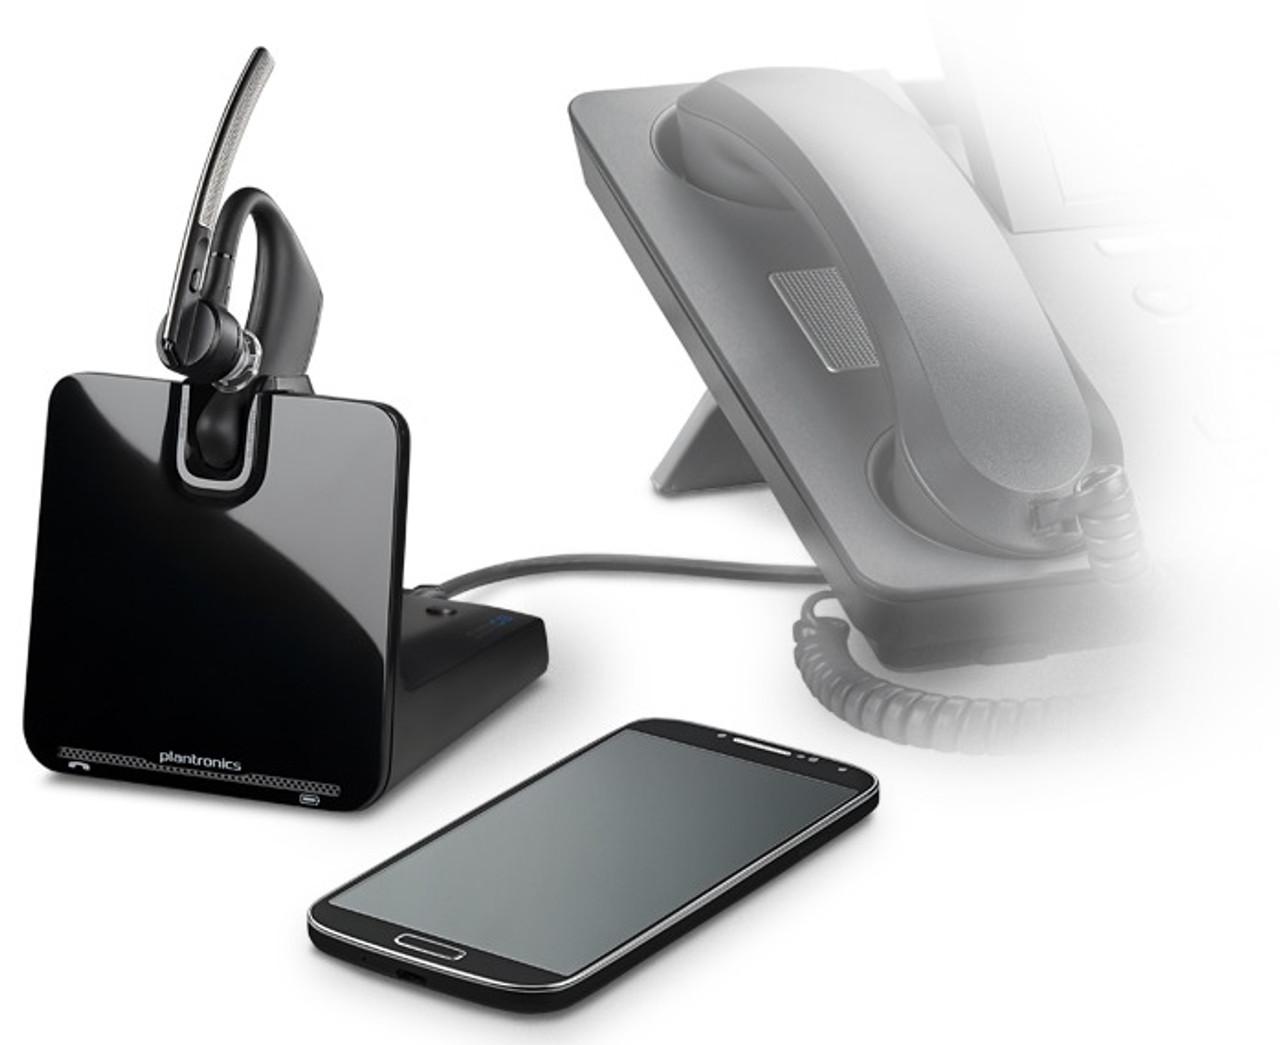 Plantronics Voyager Legend Cs Plantronics Bluetooth Wireless Headset 88863 01 Plantronics Dual Usage Smartphone Deskphone